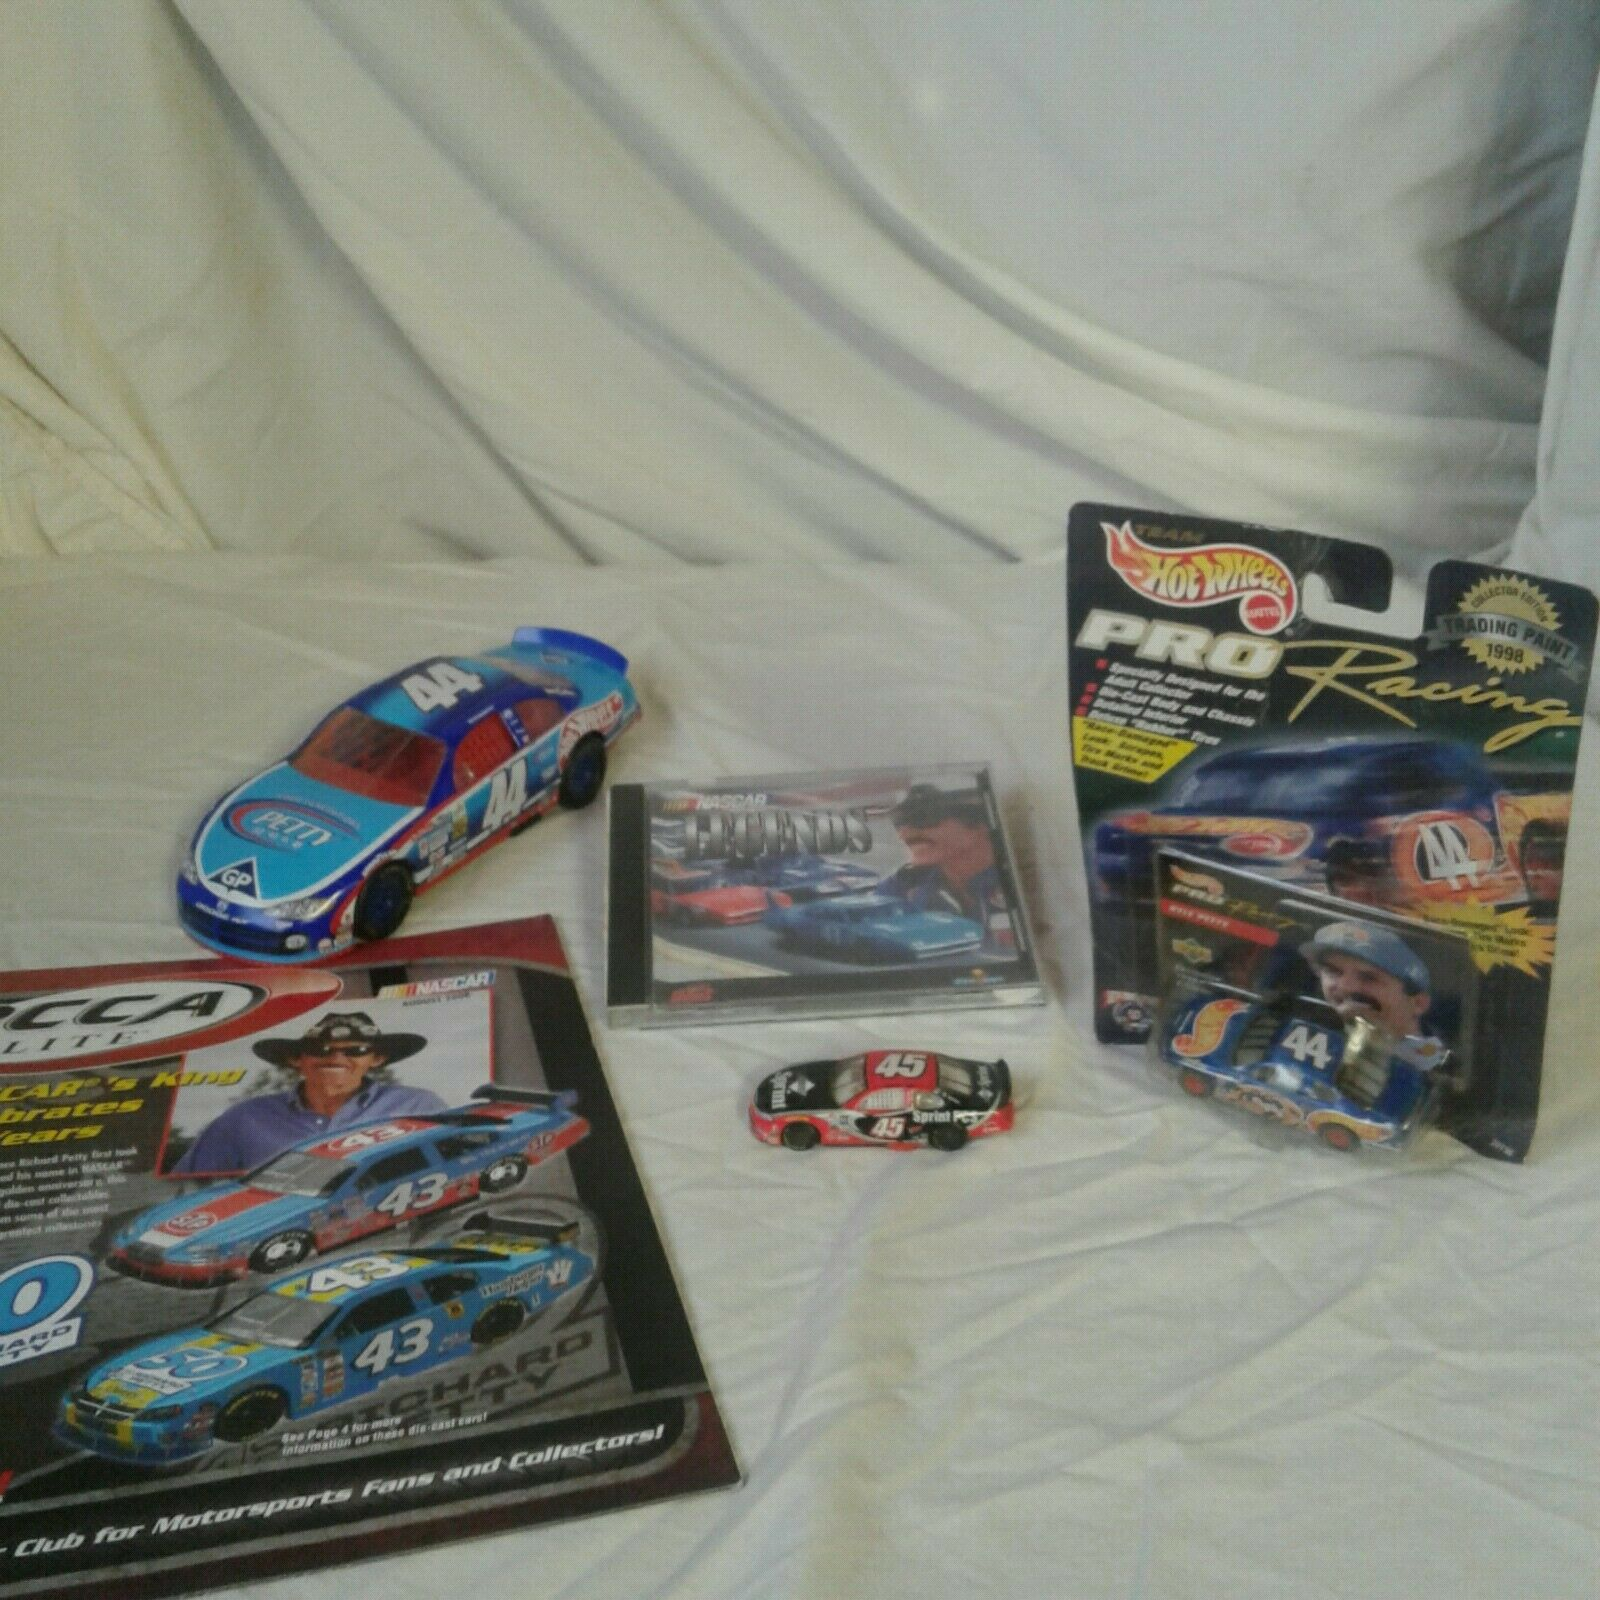 KYLE PETTY NASCAR COLLECTIBLE BUNDLE